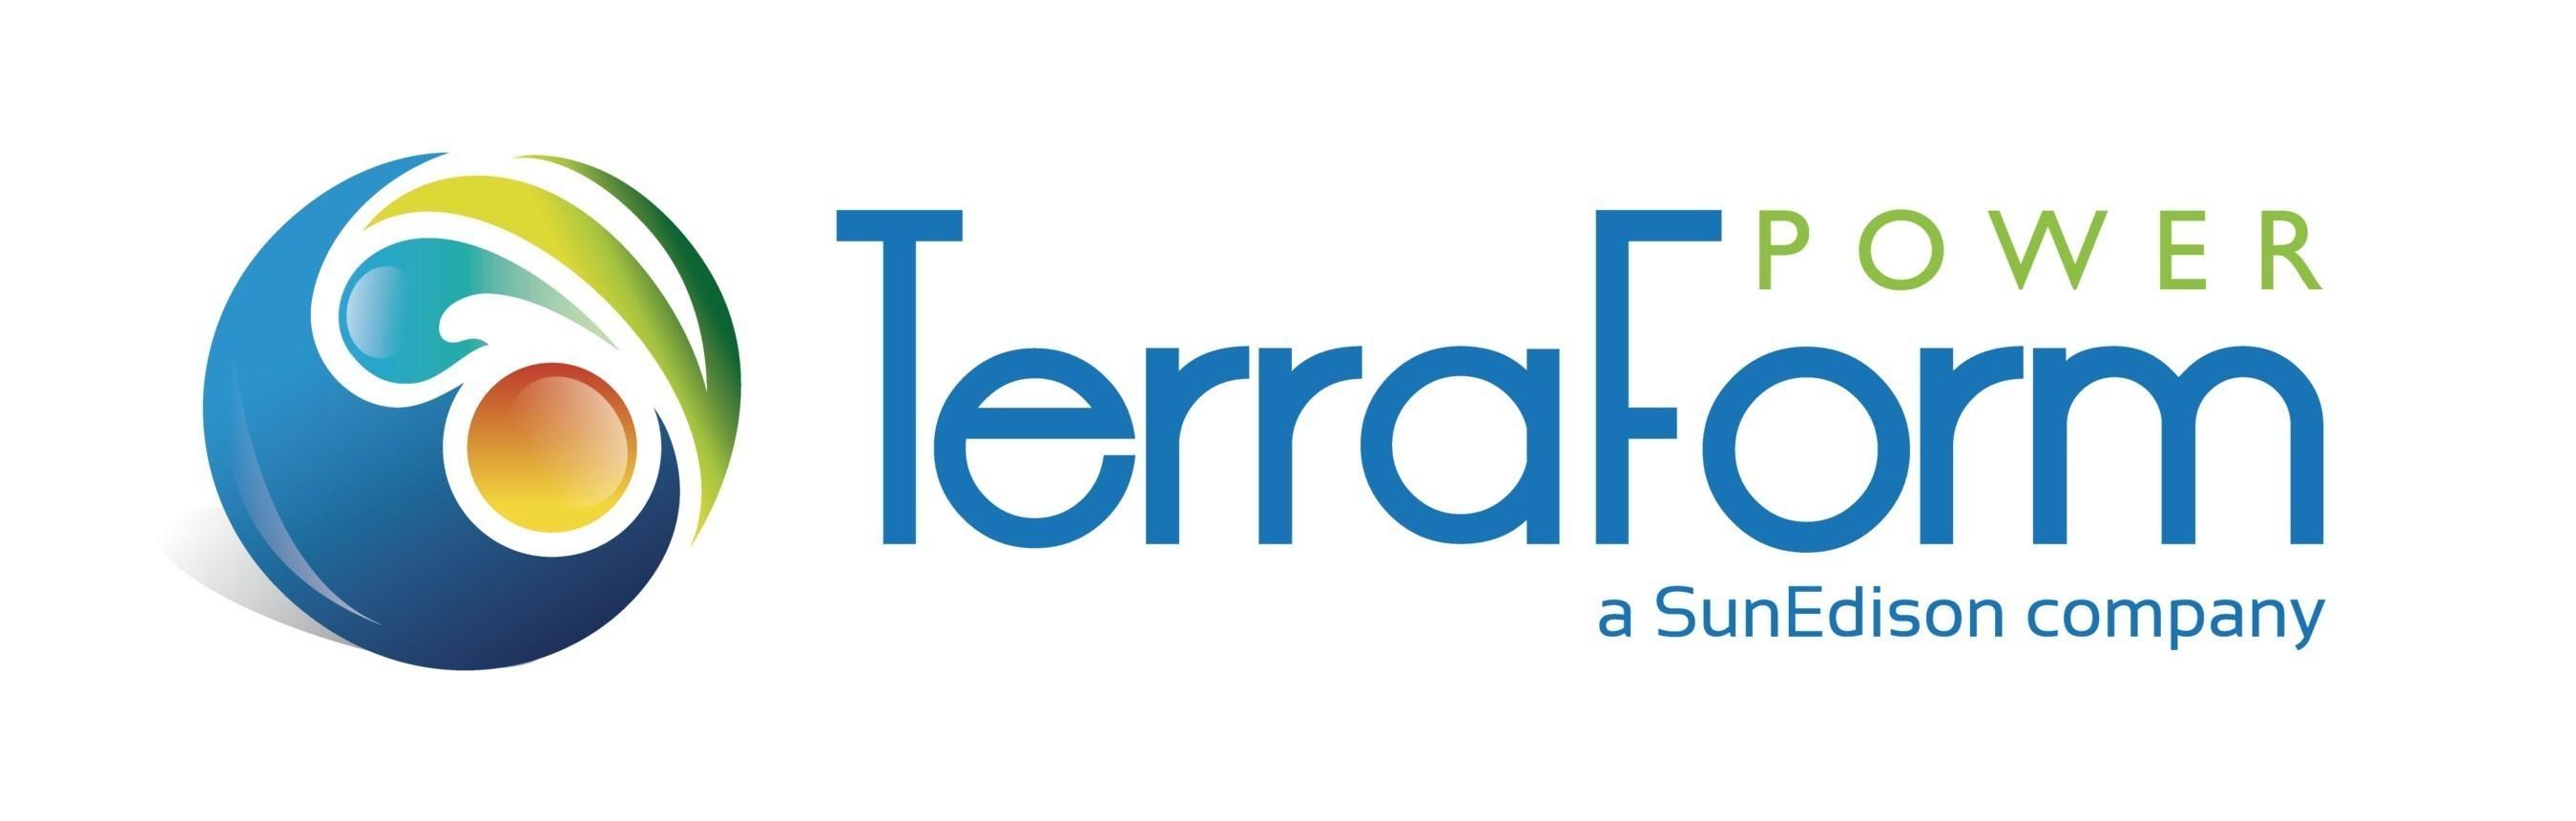 TerraForm Power logo